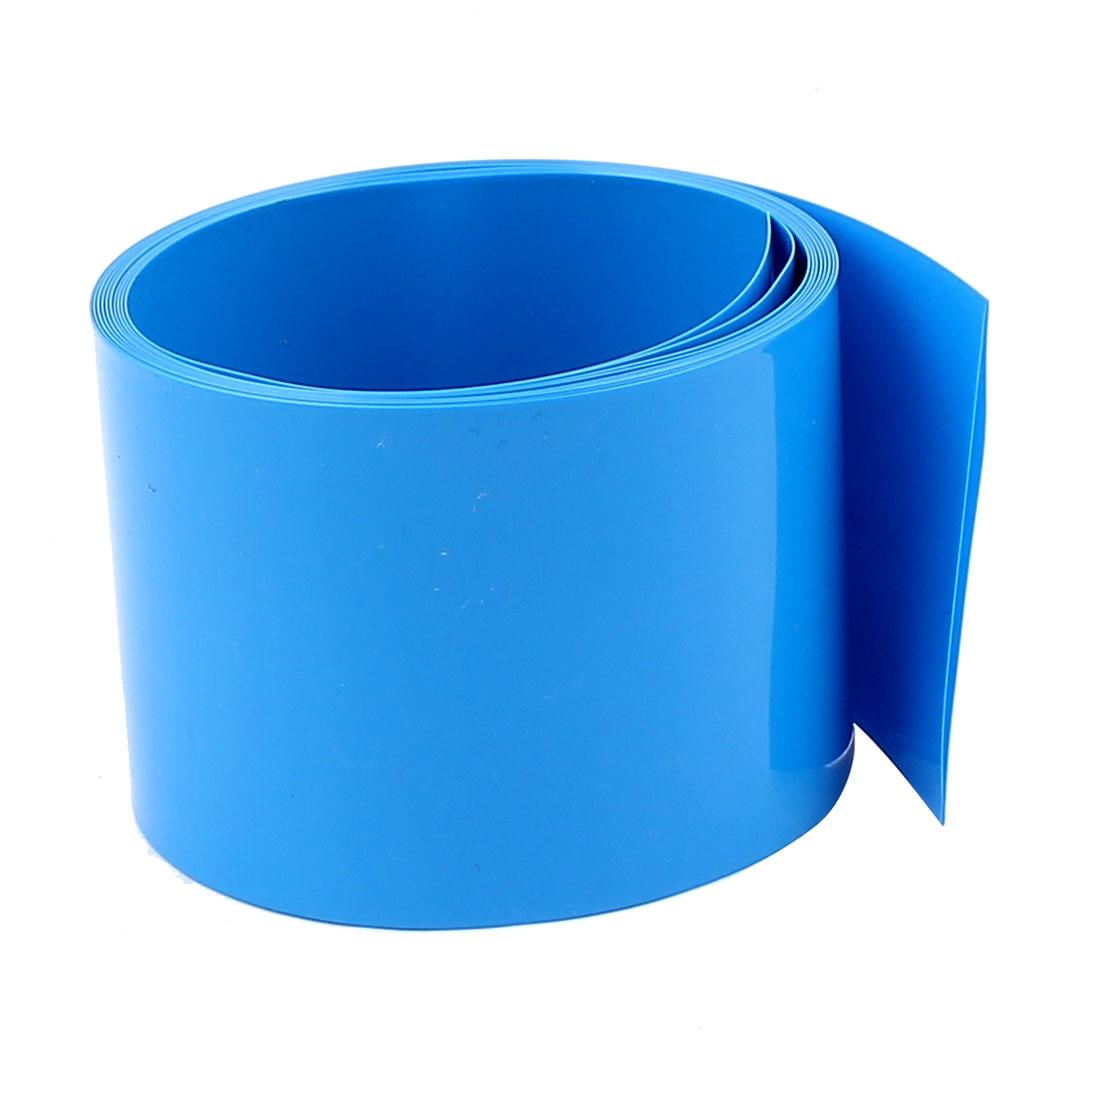 6.6ft 50mm Flat 32mm Dia PVC Heat Shrink Tubing Blue for 2 x 18650 Battery